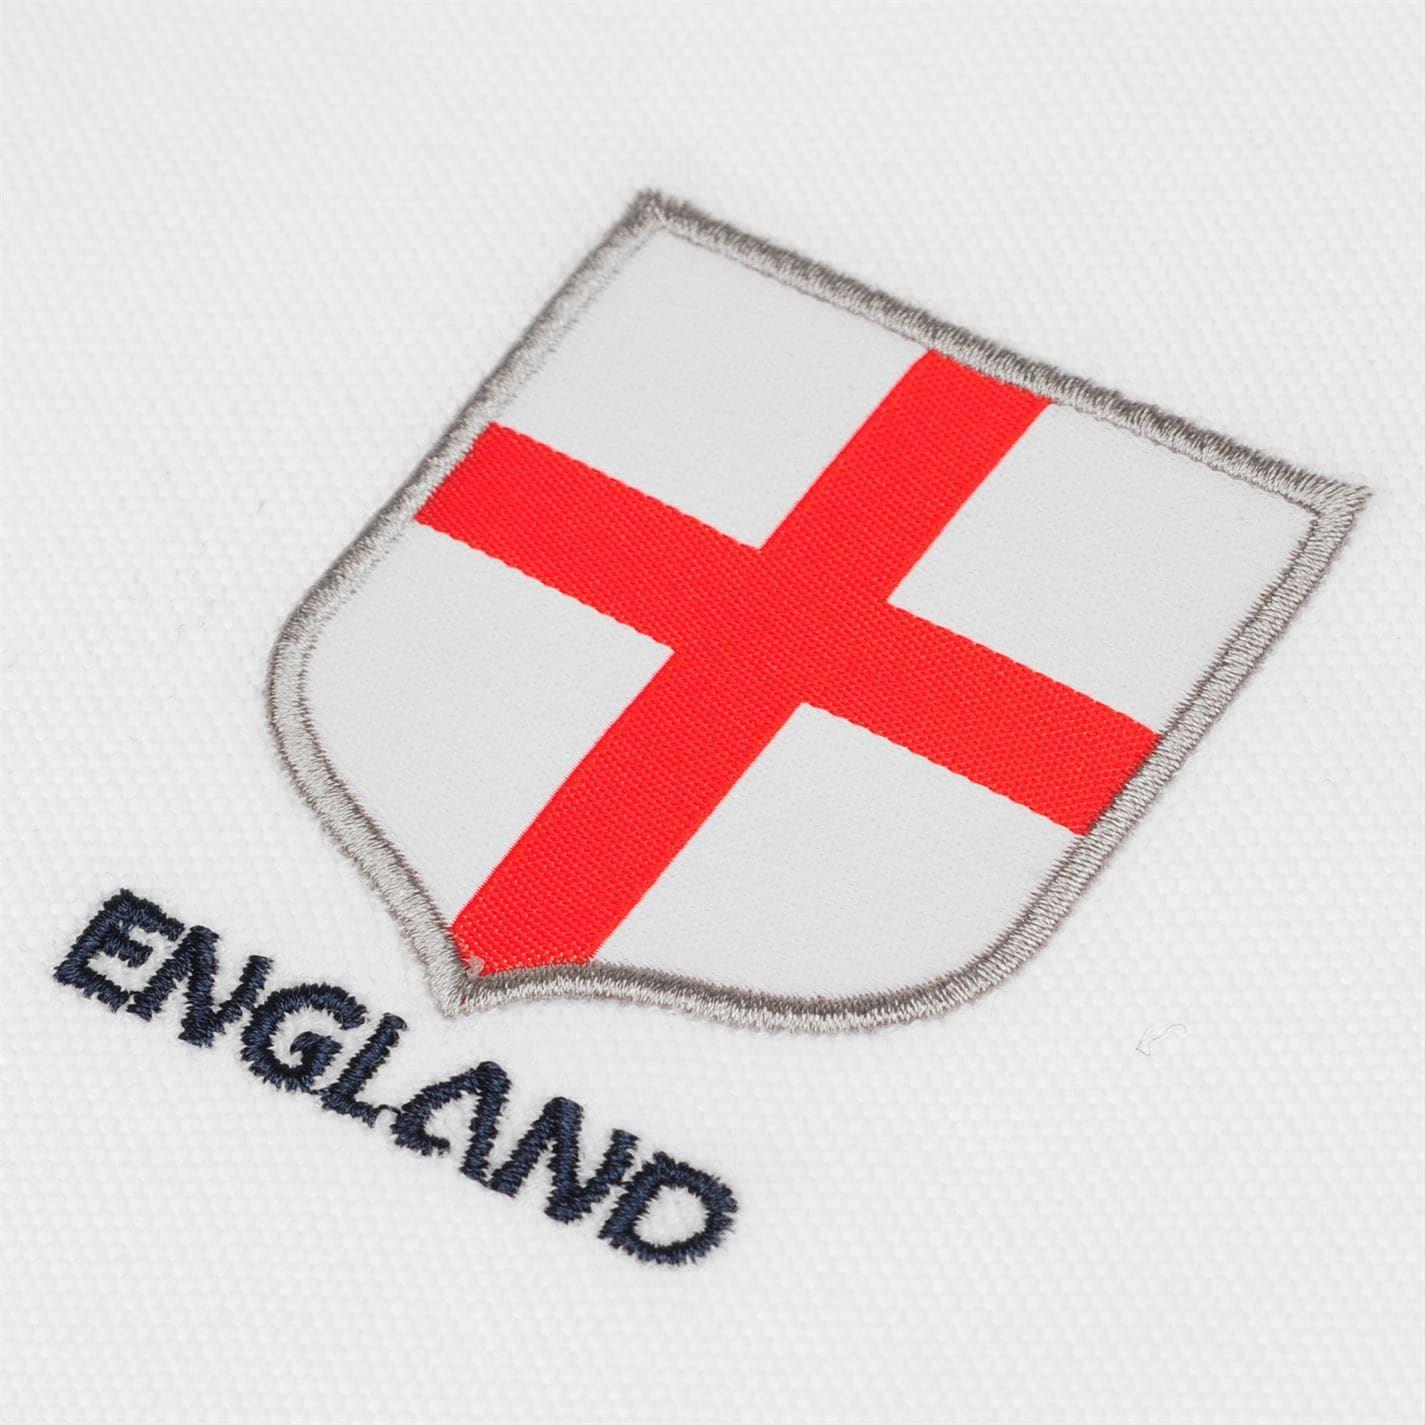 miniature 16 - FIFA Coupe du monde 2018 Angleterre Polo Shirt Homme Football Soccer Top T-Shirt Tee